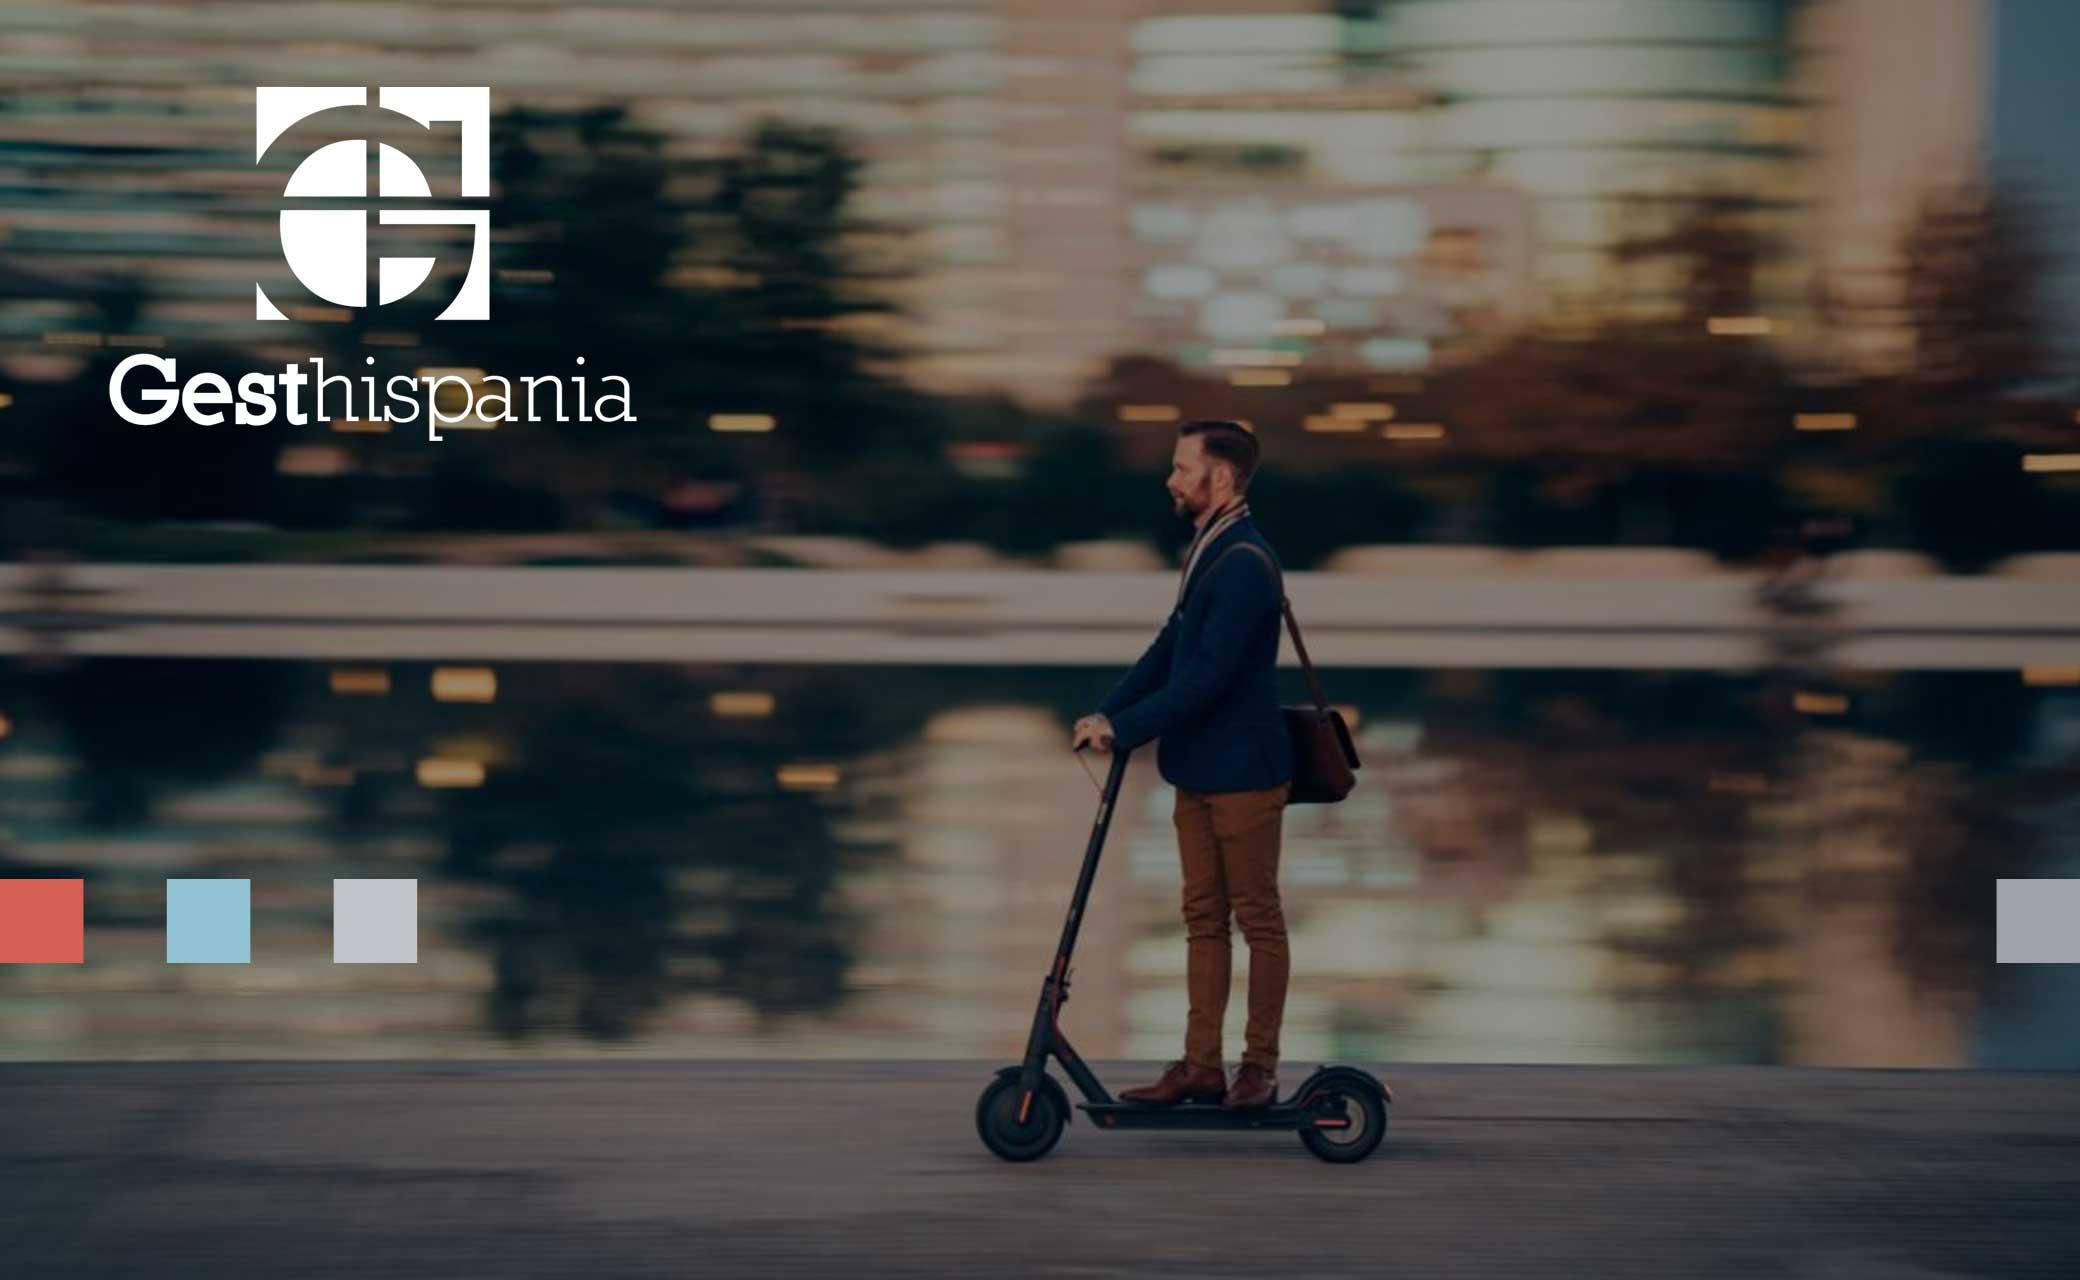 gesthispania-patinetes-electricos